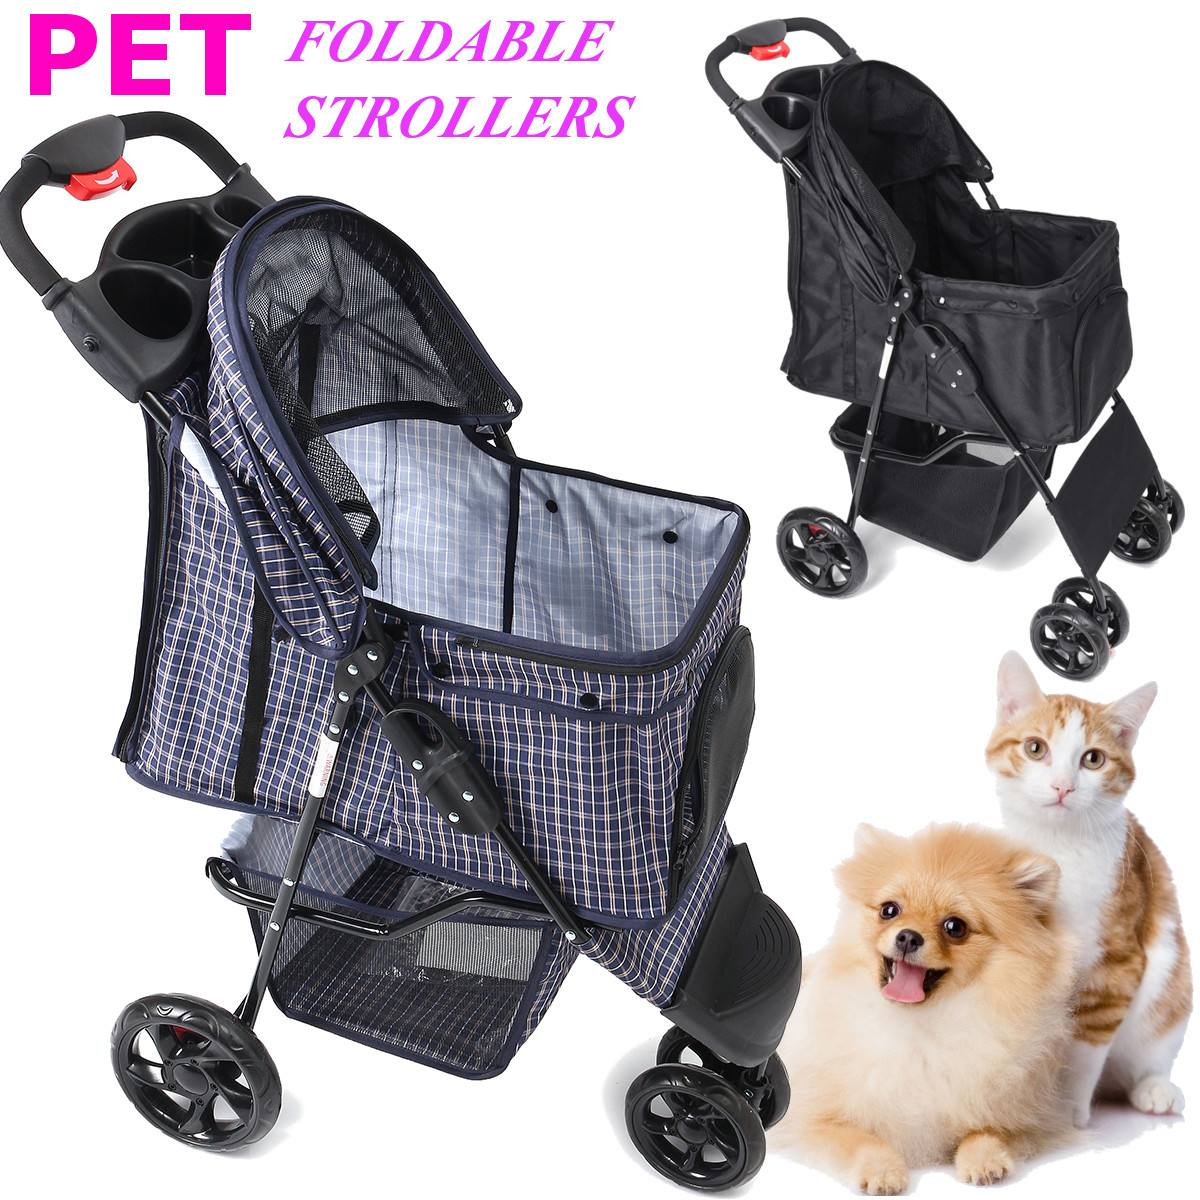 2 Colors Foldable Pet Stroller Dog Cat Puppy Sitting Lying Pushchair Stroller Cart Outdoor Lightweight Travel Carrier Pram